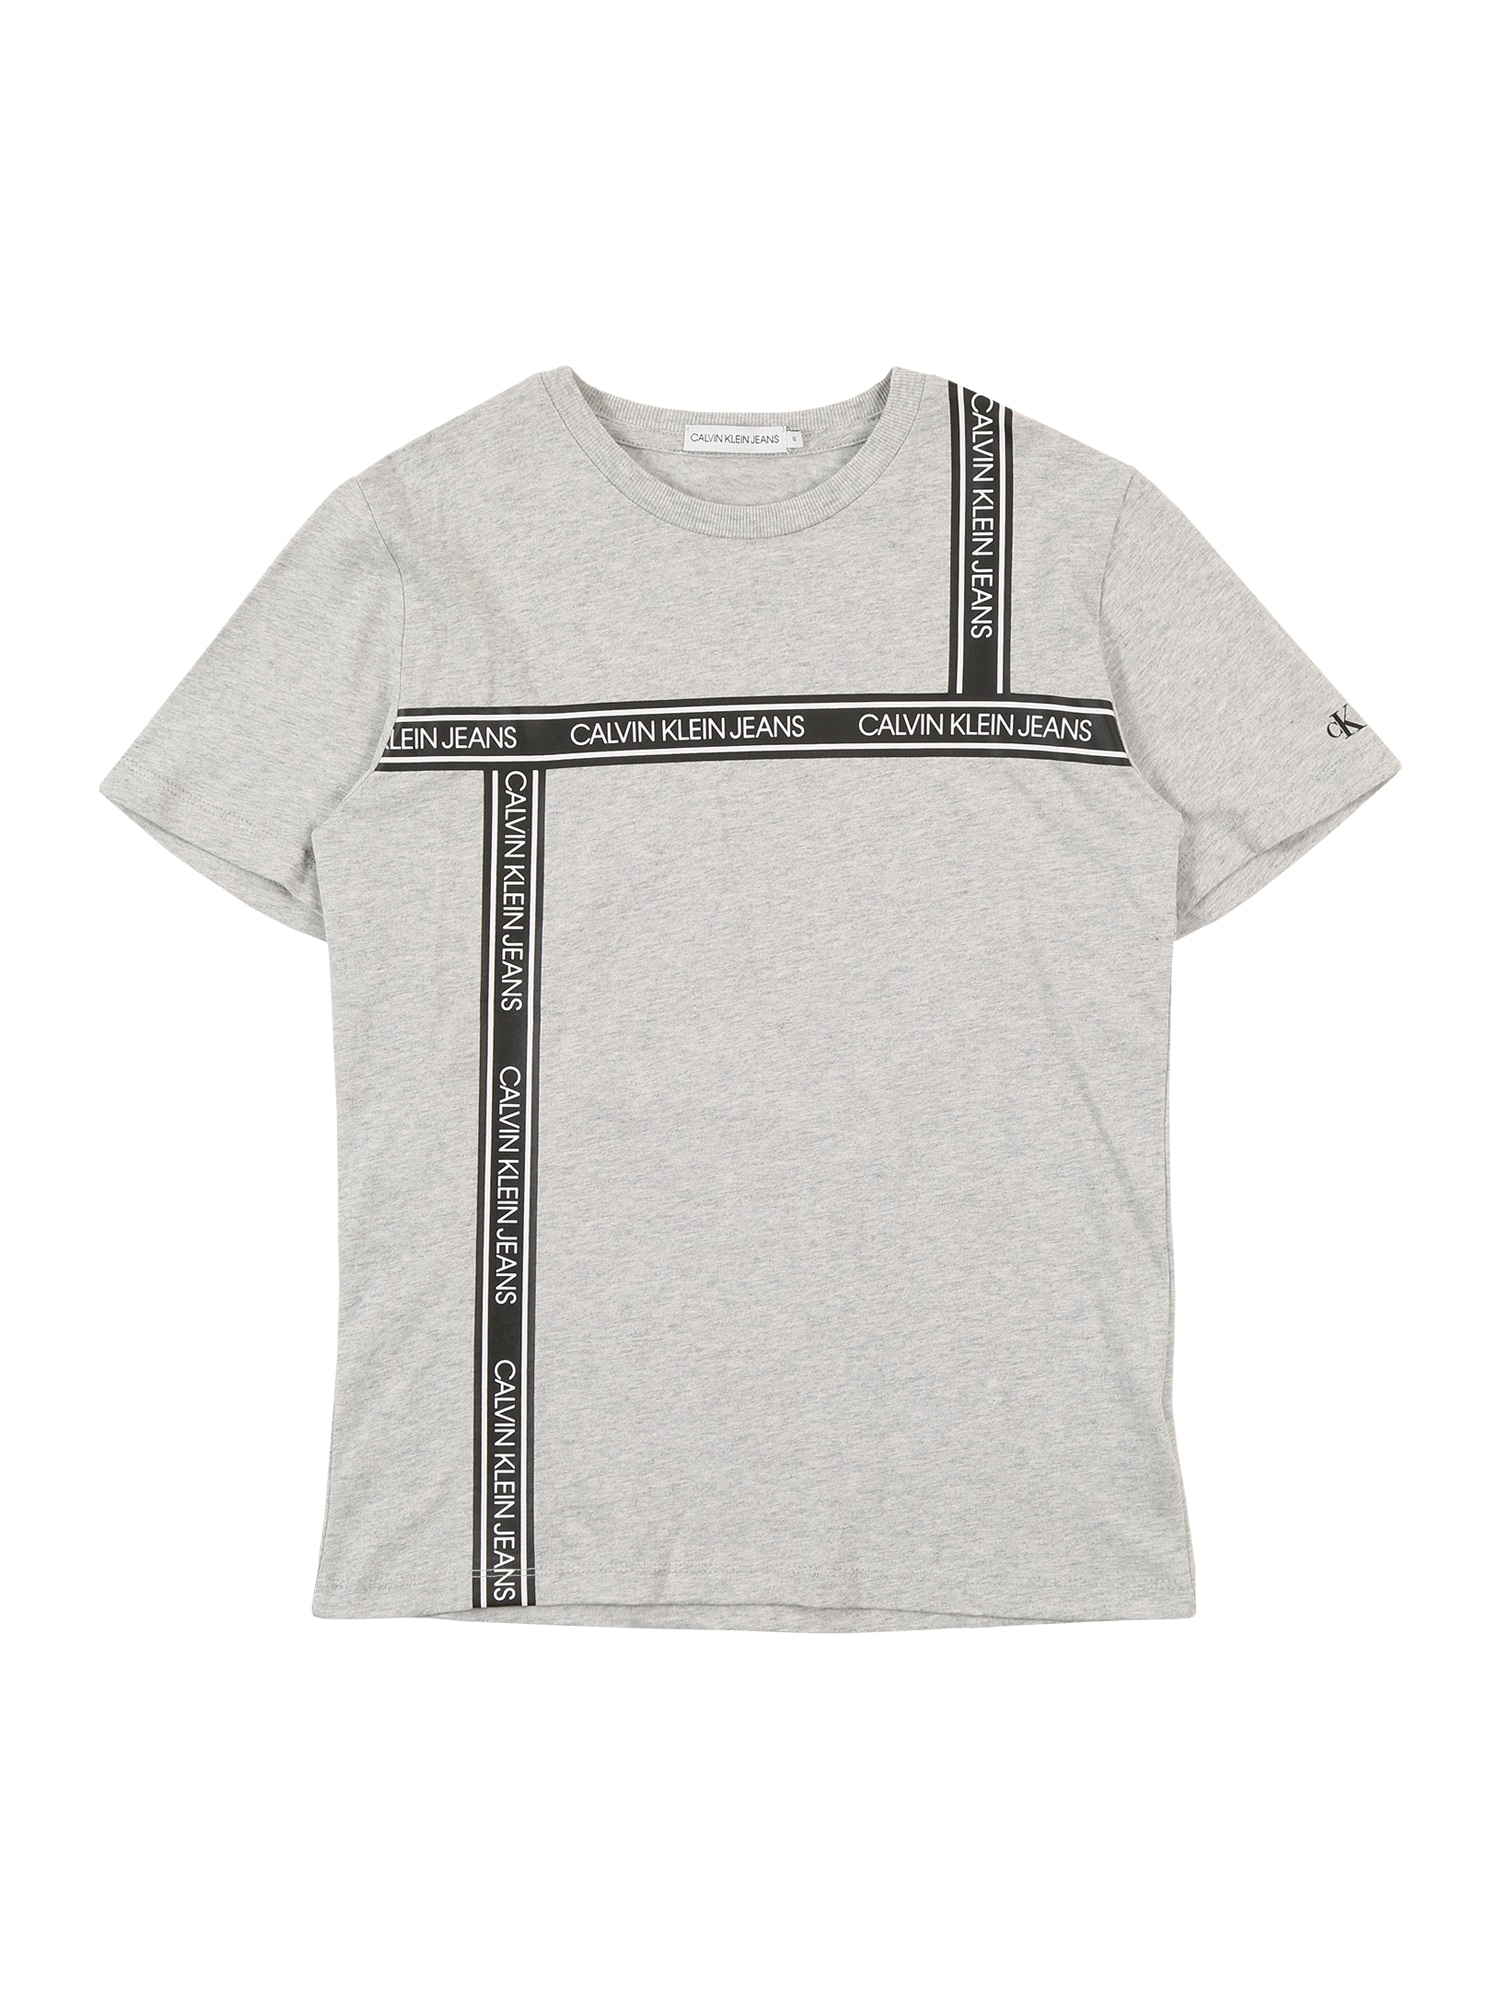 Calvin Klein Jeans Marškinėliai margai pilka / pilka / balta